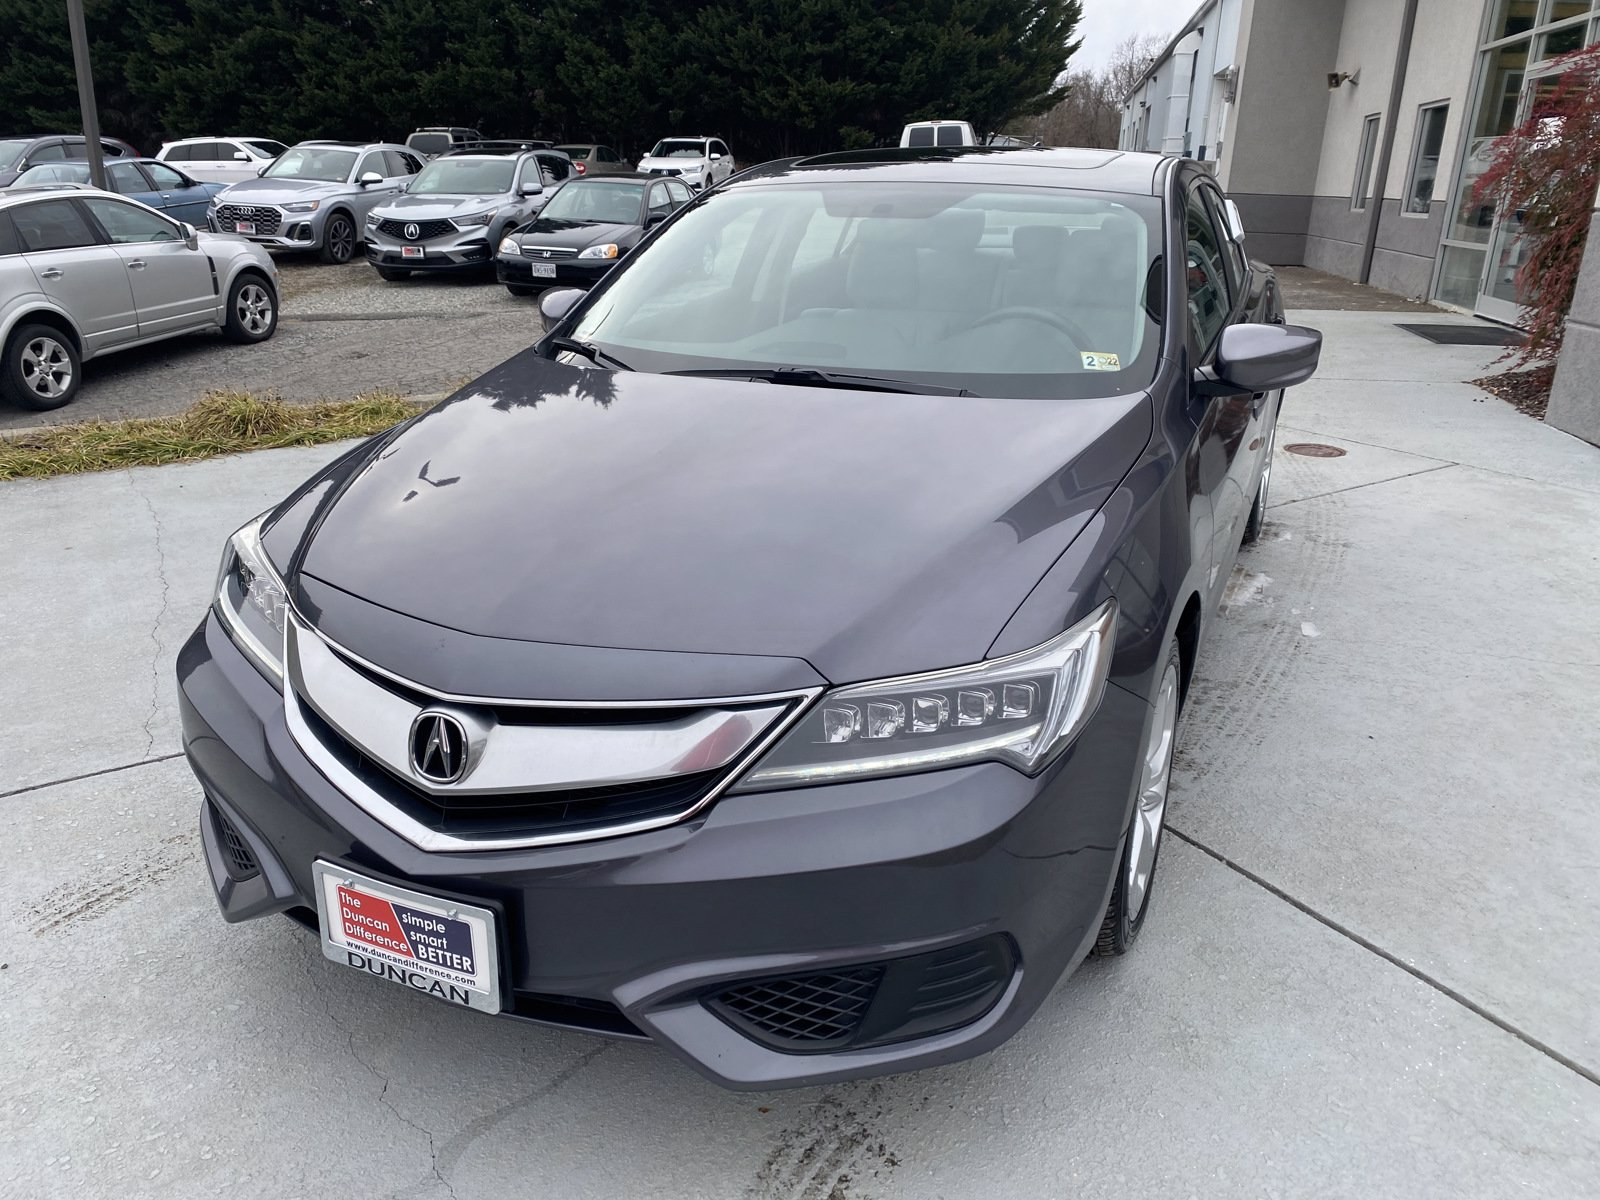 Used Cars For Sale In Roanoke Va Duncan Acura